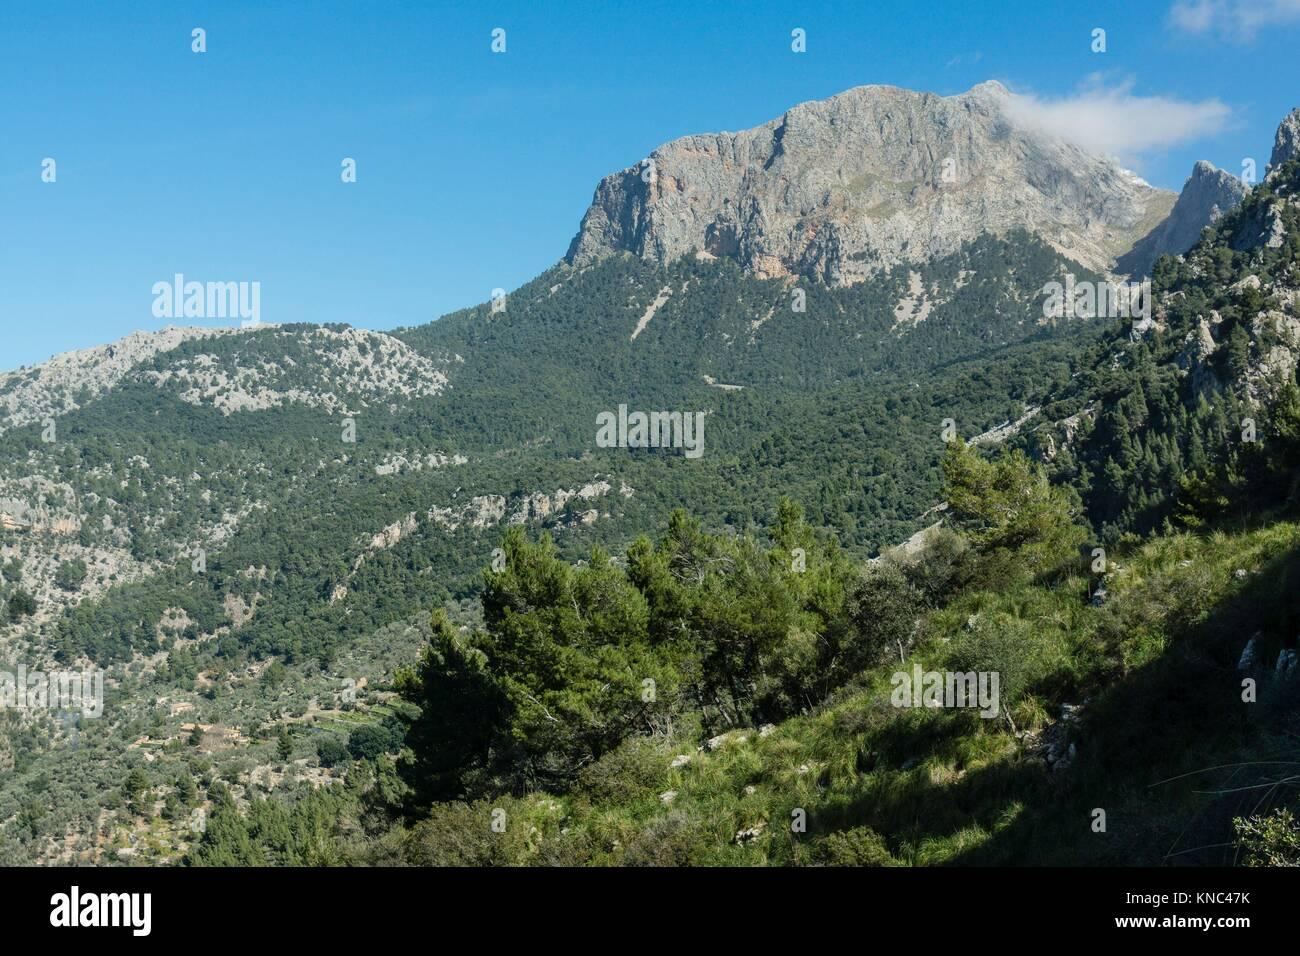 Portell de Sa Costa, Soller, parque natural sierra de Tramuntana, Mallorca, balearic islands, spain, europen. - Stock Image